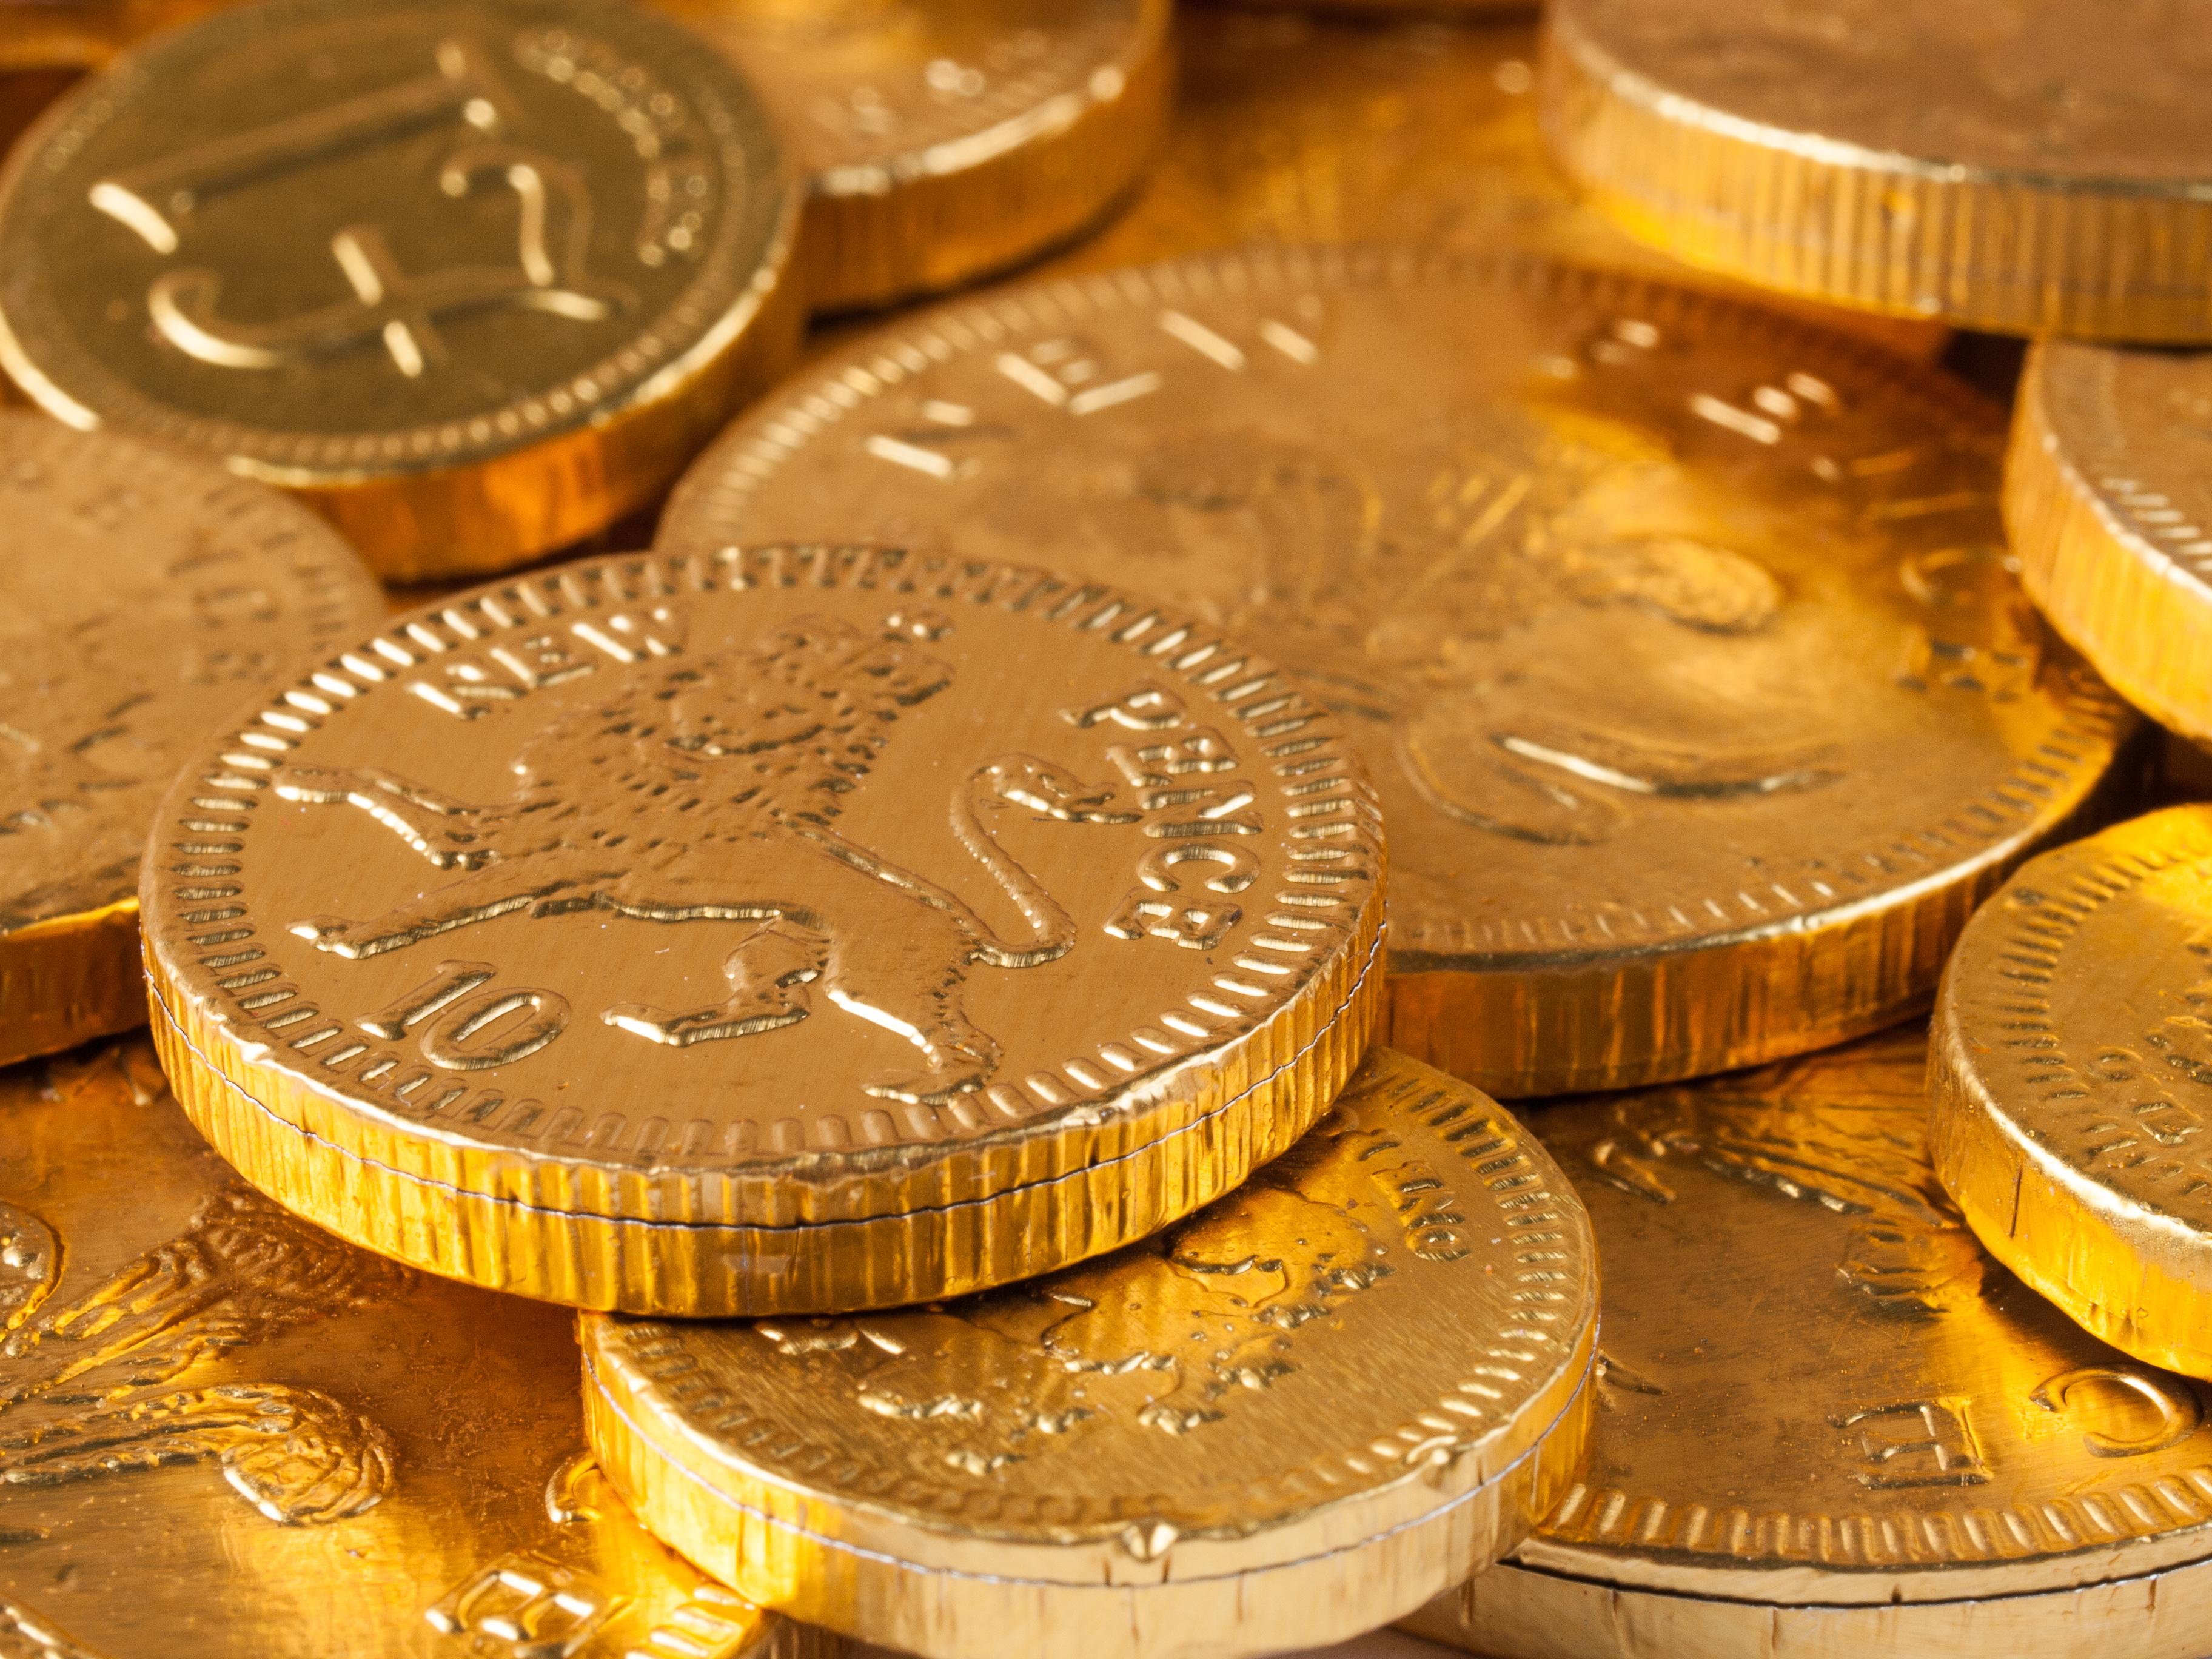 File:Chocolate Coins (11734232374).jpg - Wikimedia Commons